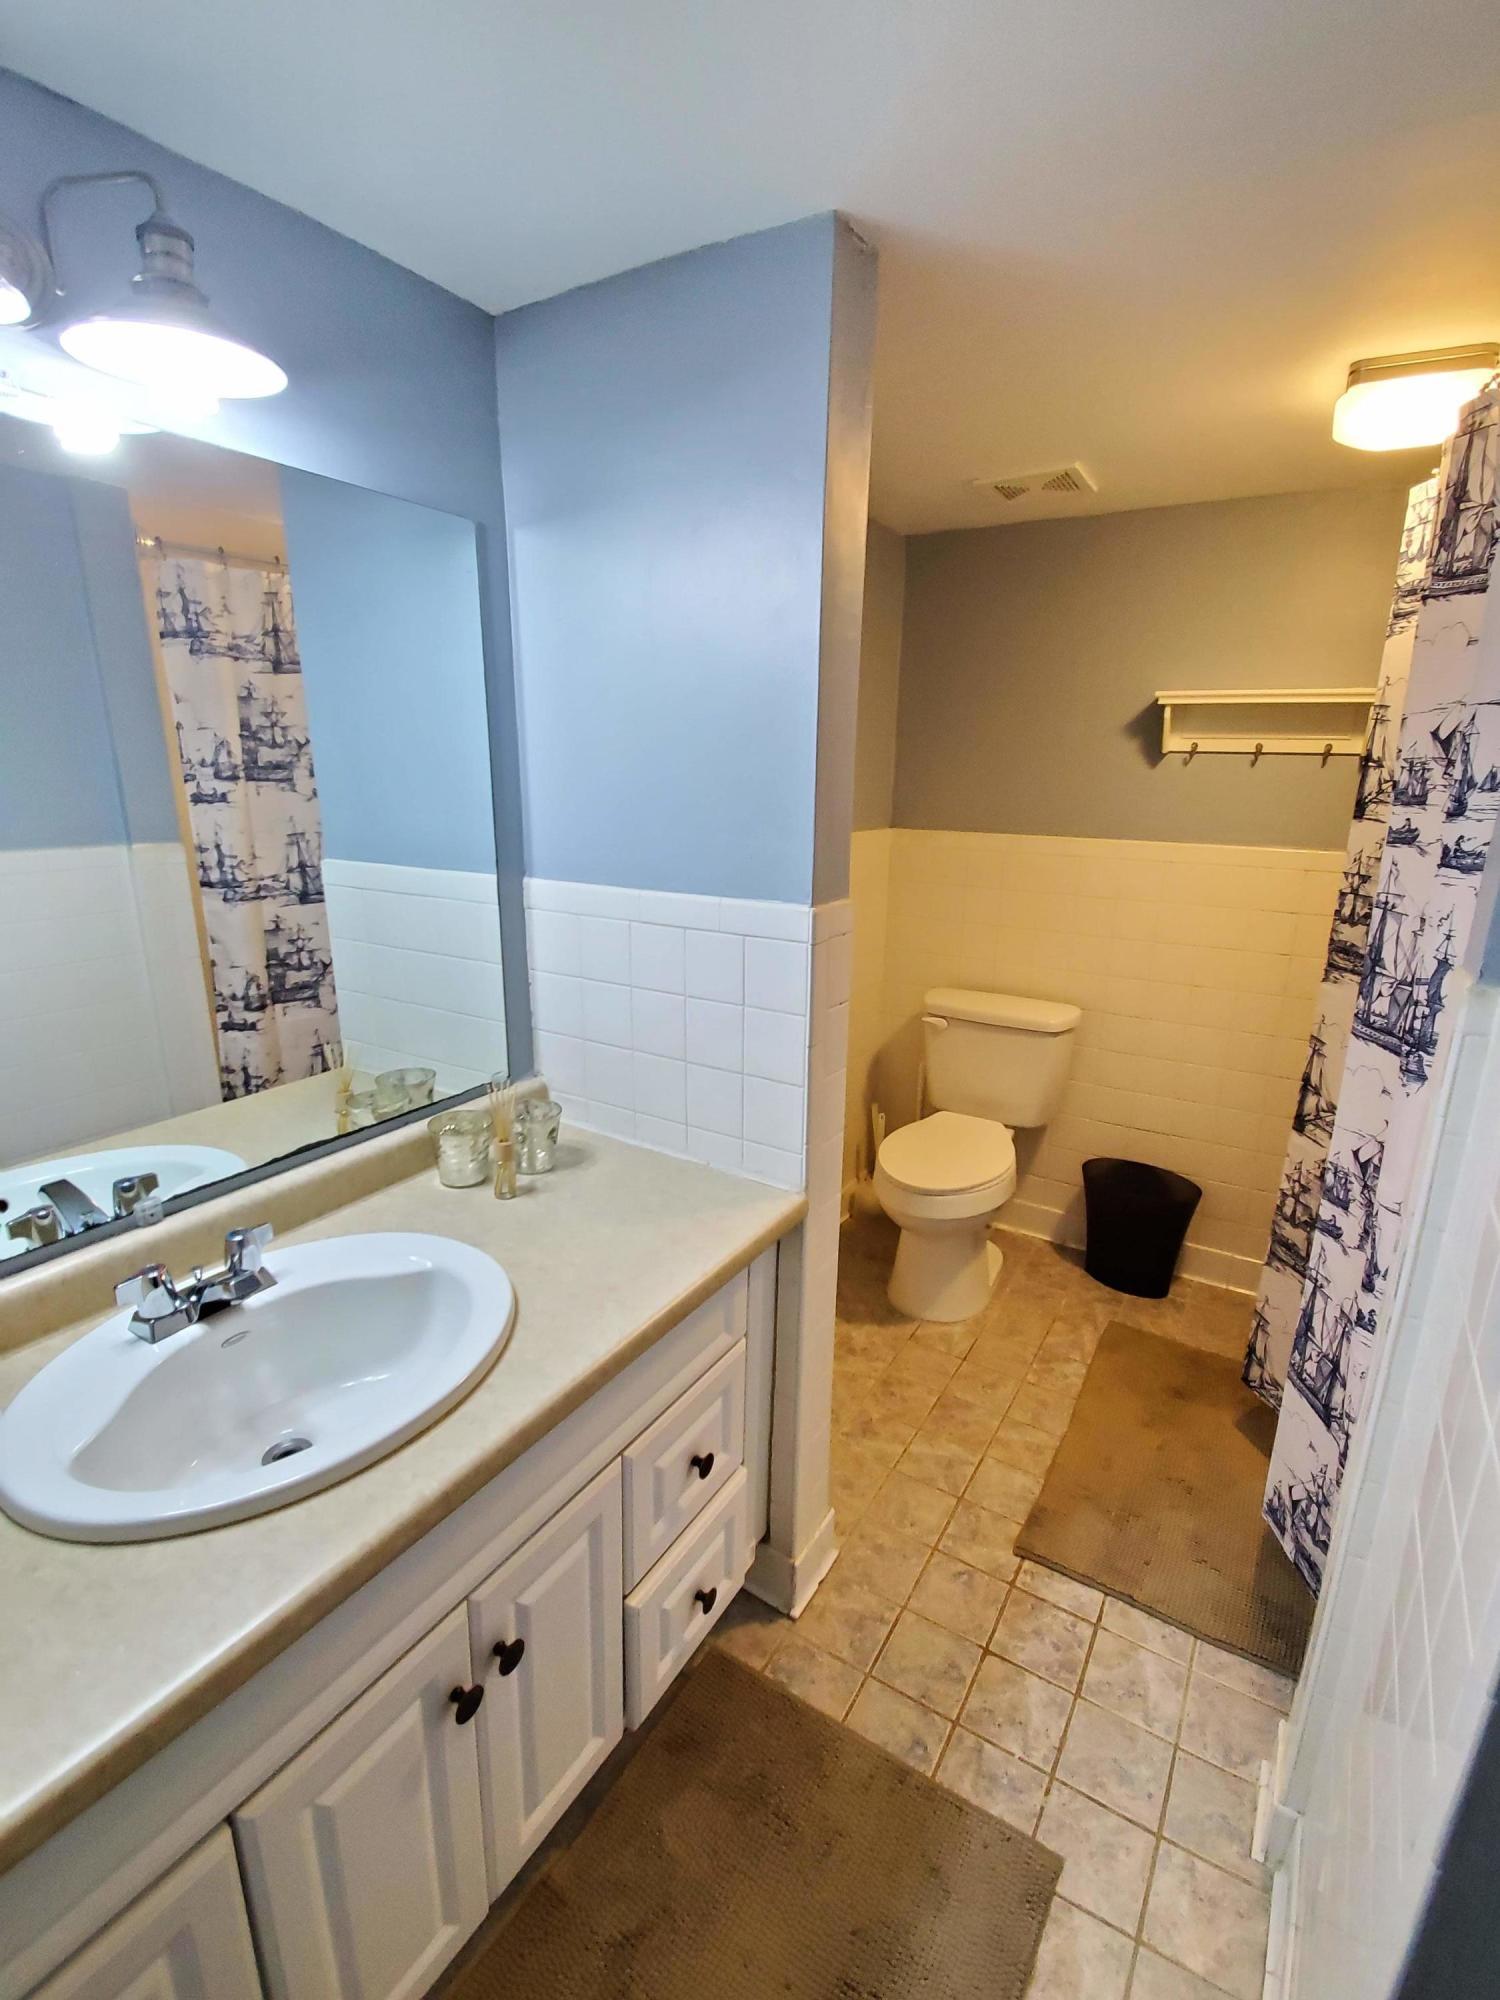 Snee Farm Homes For Sale - 105 Ventura, Mount Pleasant, SC - 37